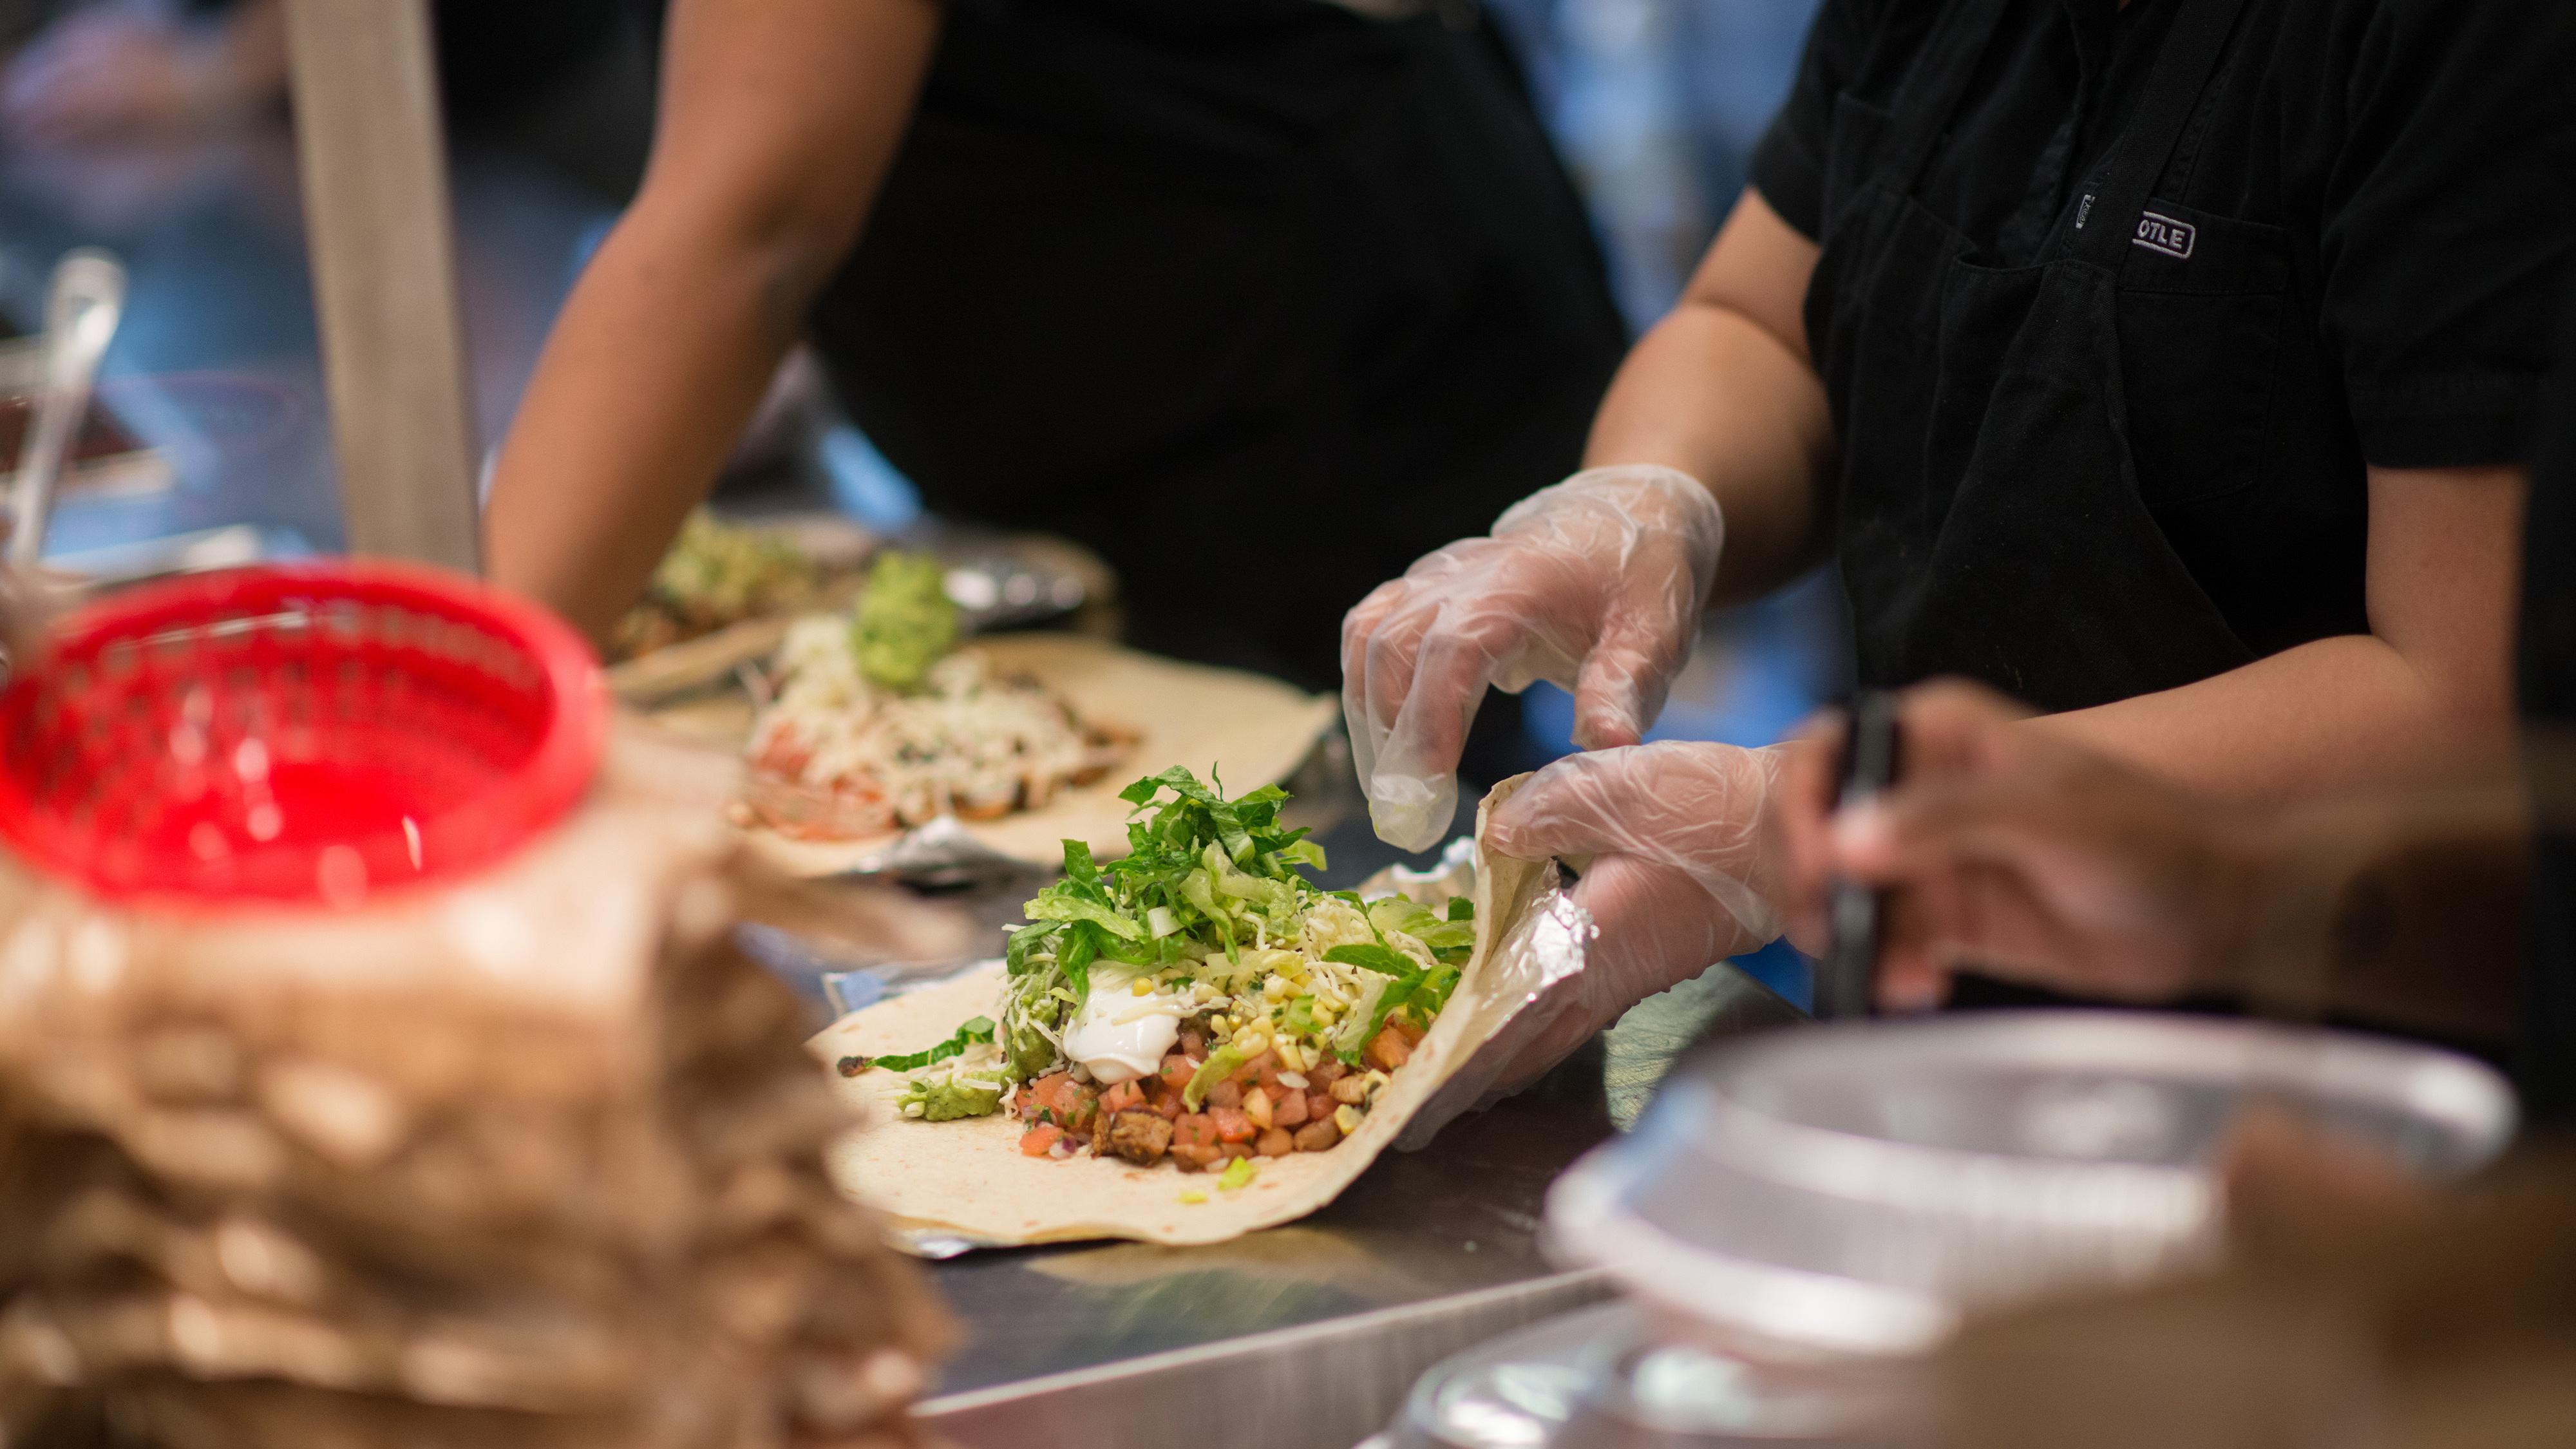 How The Minimum Wage Affects Restaurant Hygiene